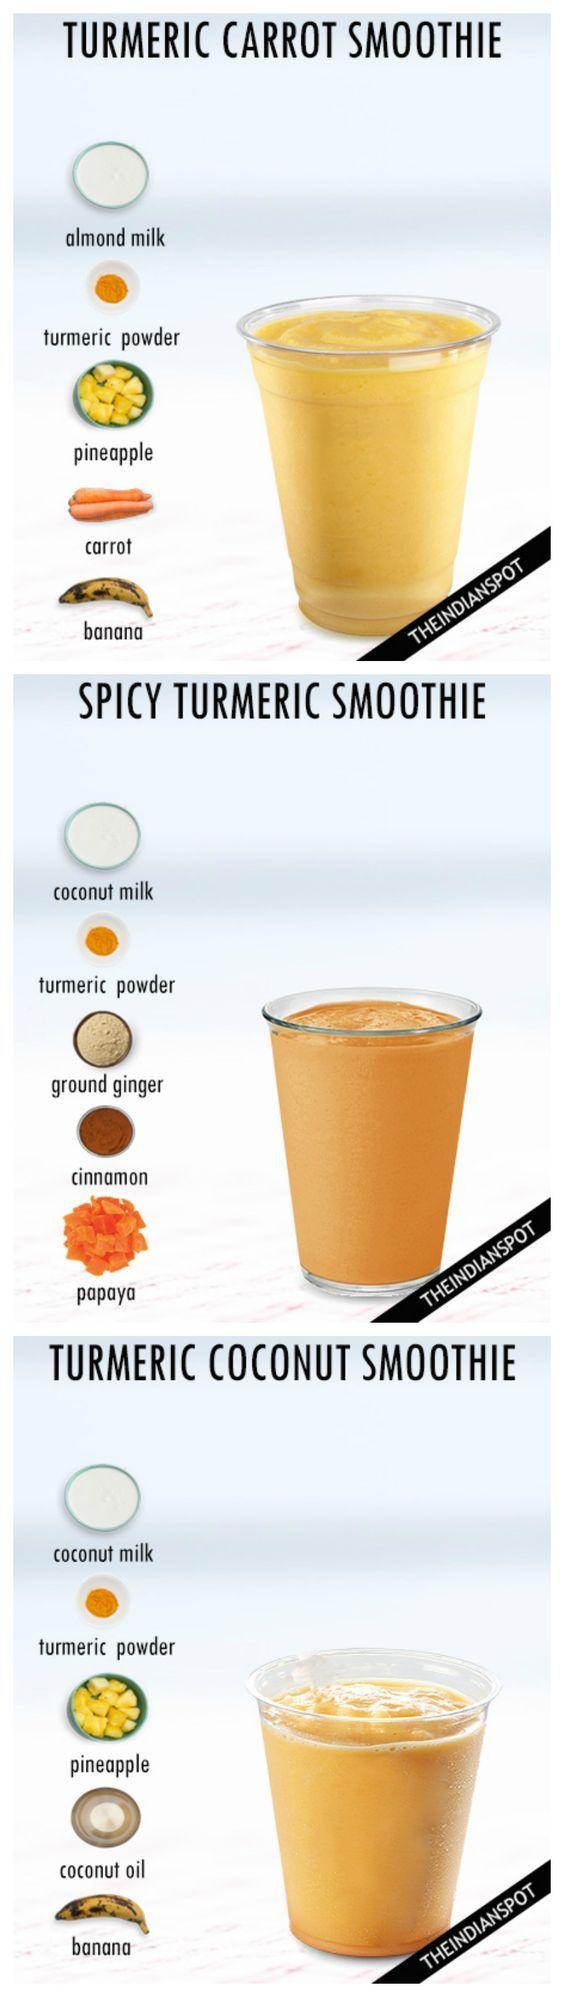 HEALING TURMERIC SMOOTHIE RECIPES